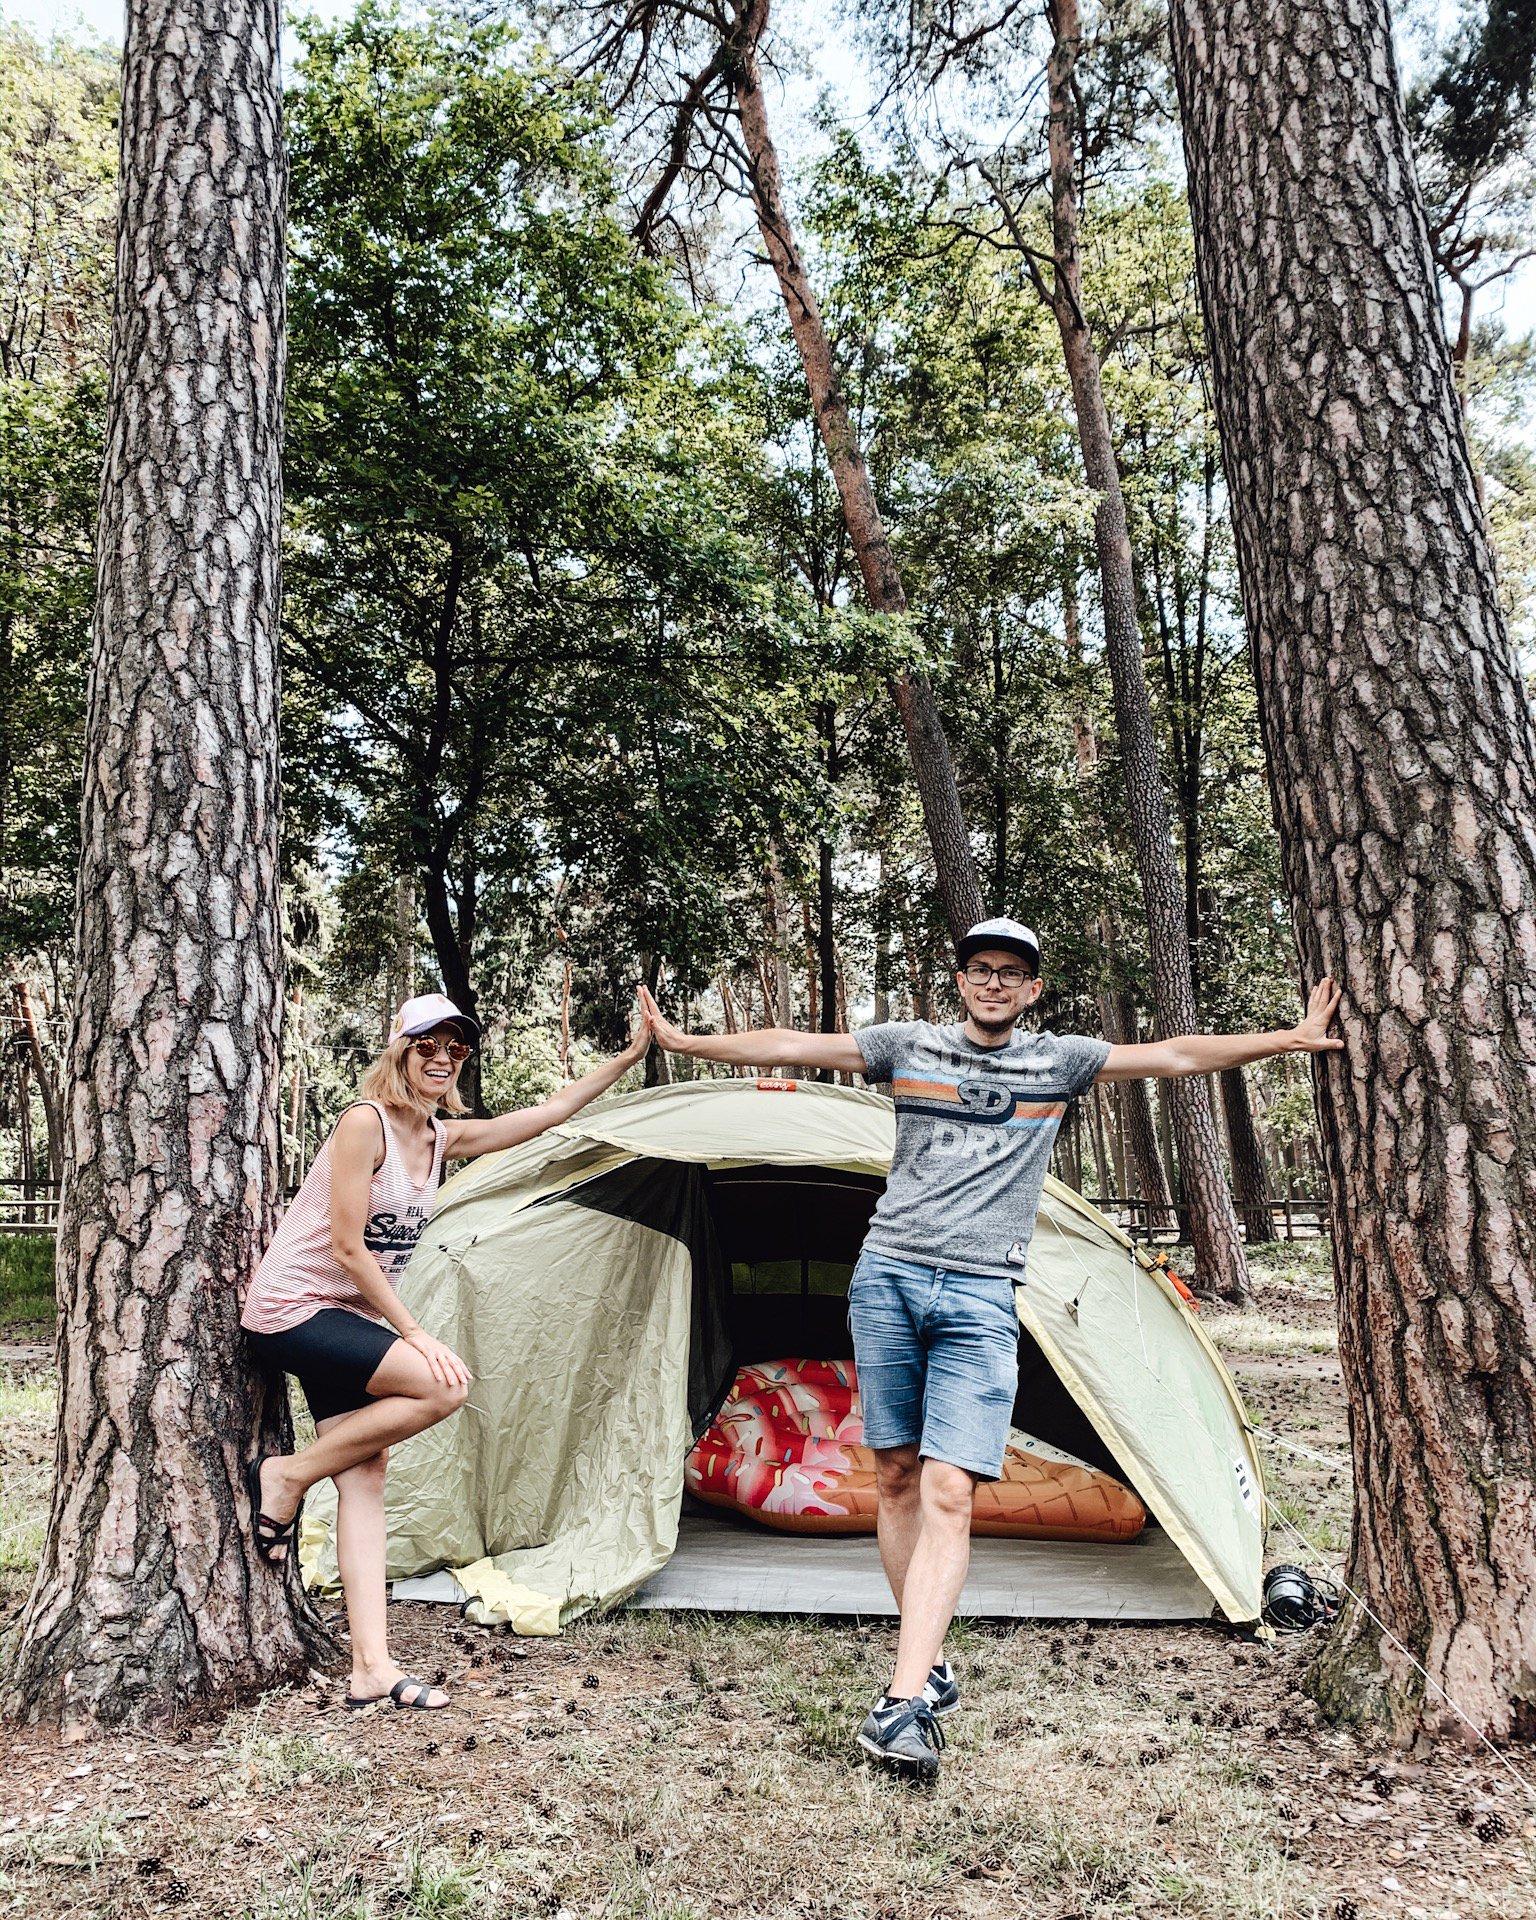 wakacje pod namiotem